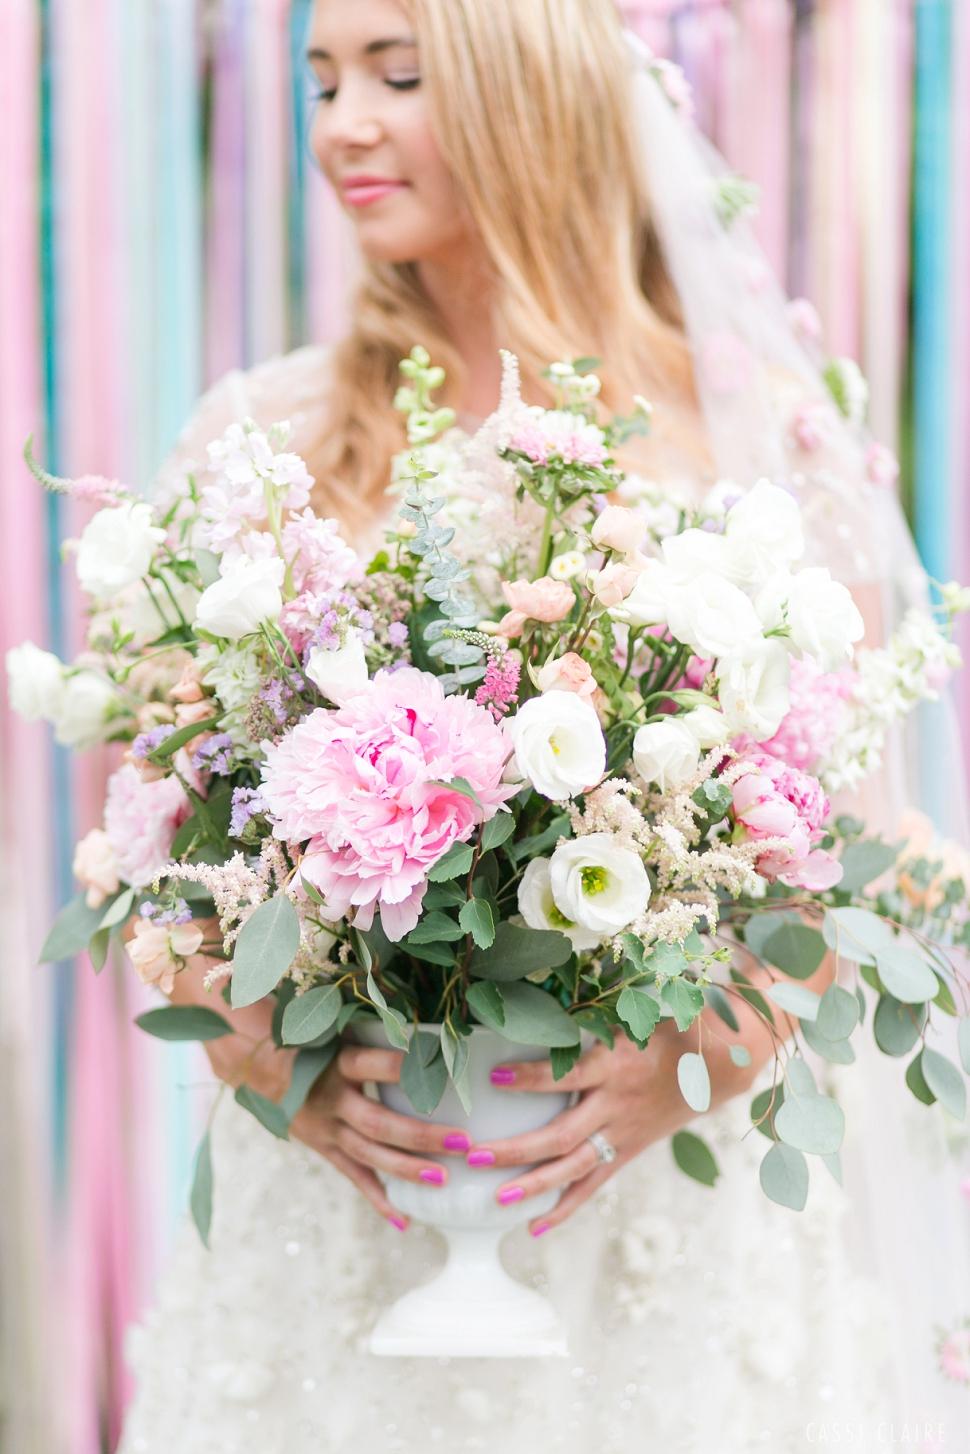 Anthropologie-Wedding_CassiClaire_02.jpg